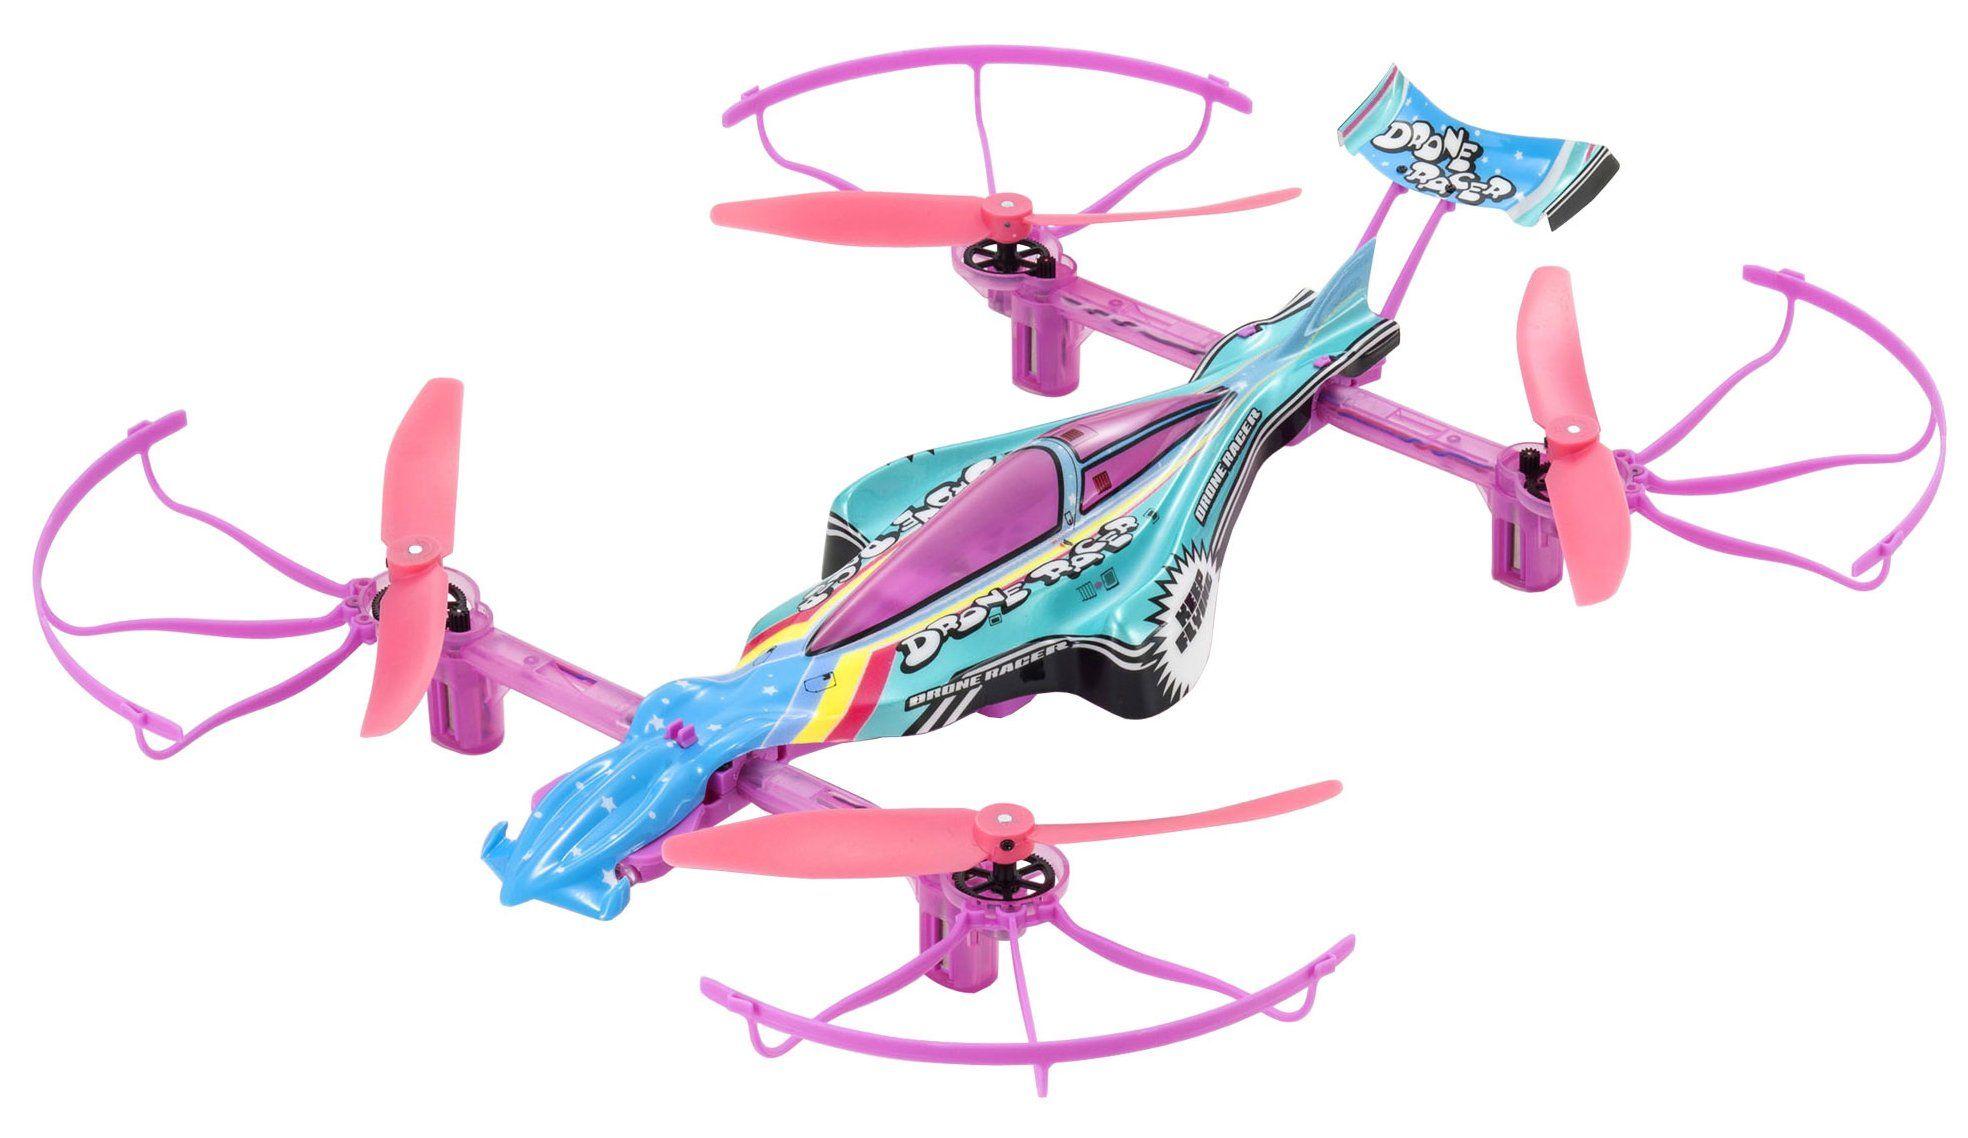 Kyosho Airplanes Rtf Racing Drone Pastel Rainbow *** Click